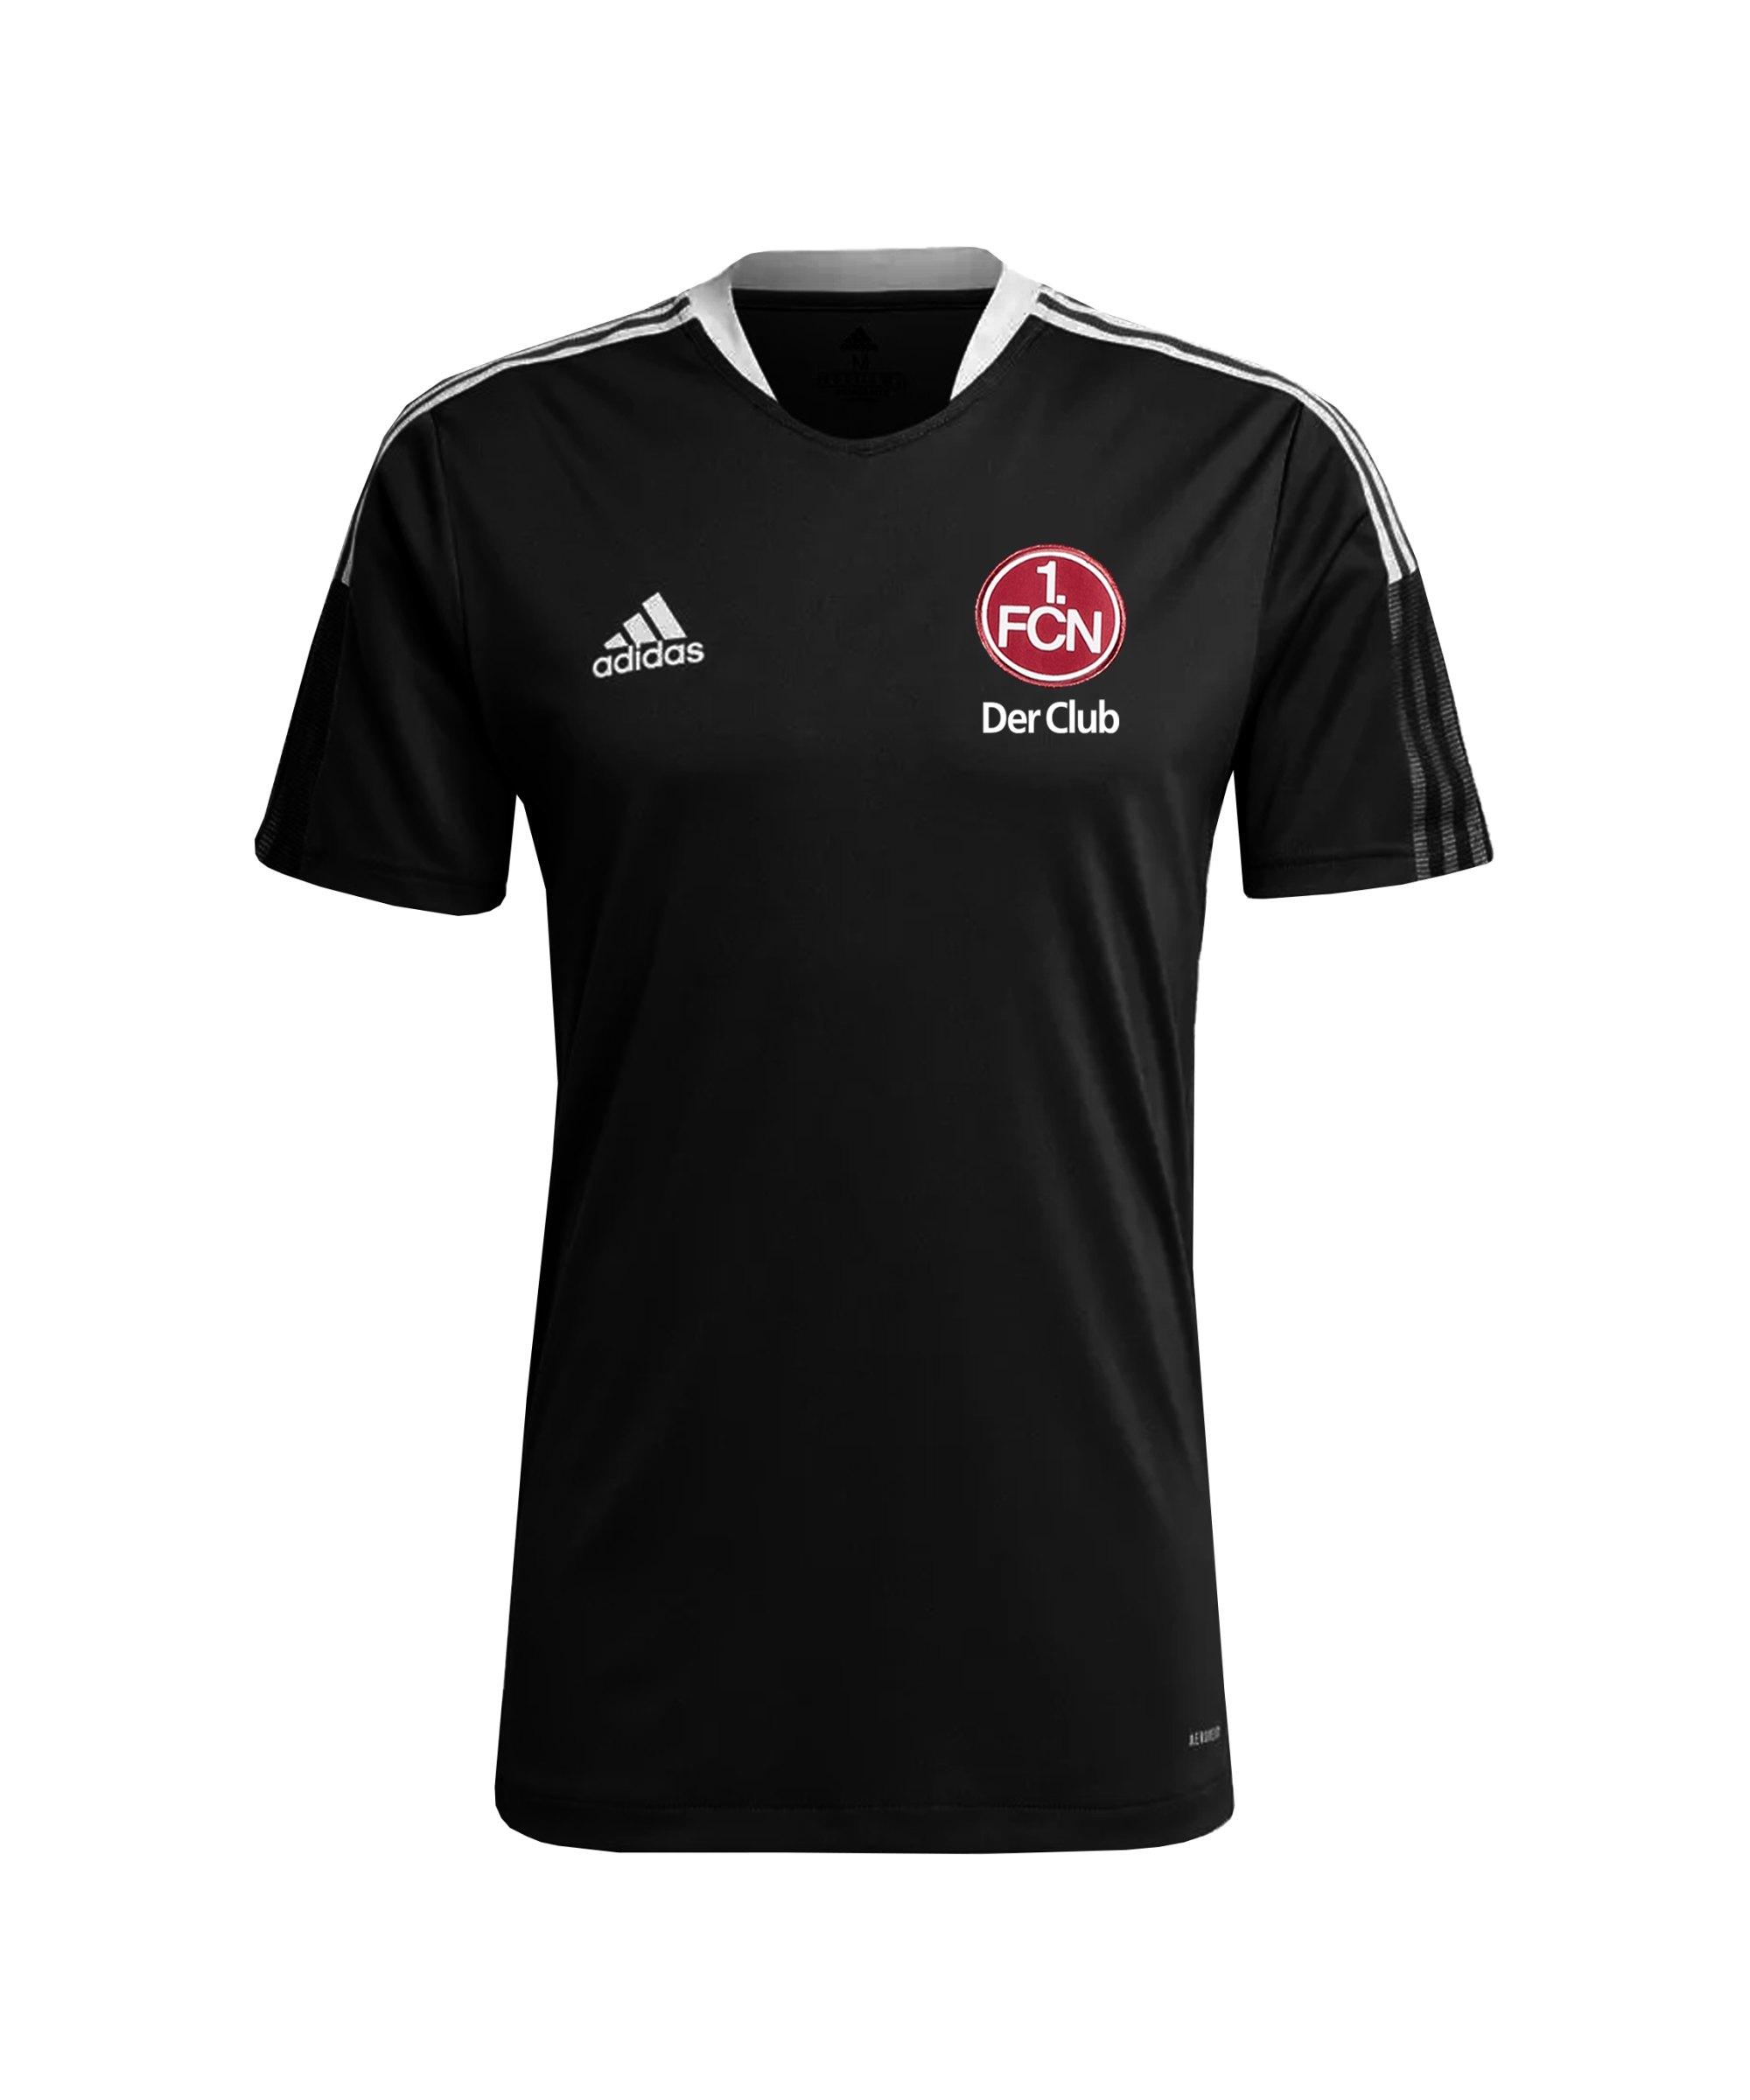 adidas 1. FC Nürnberg Trainingsshirt Kids Schwarz - schwarz